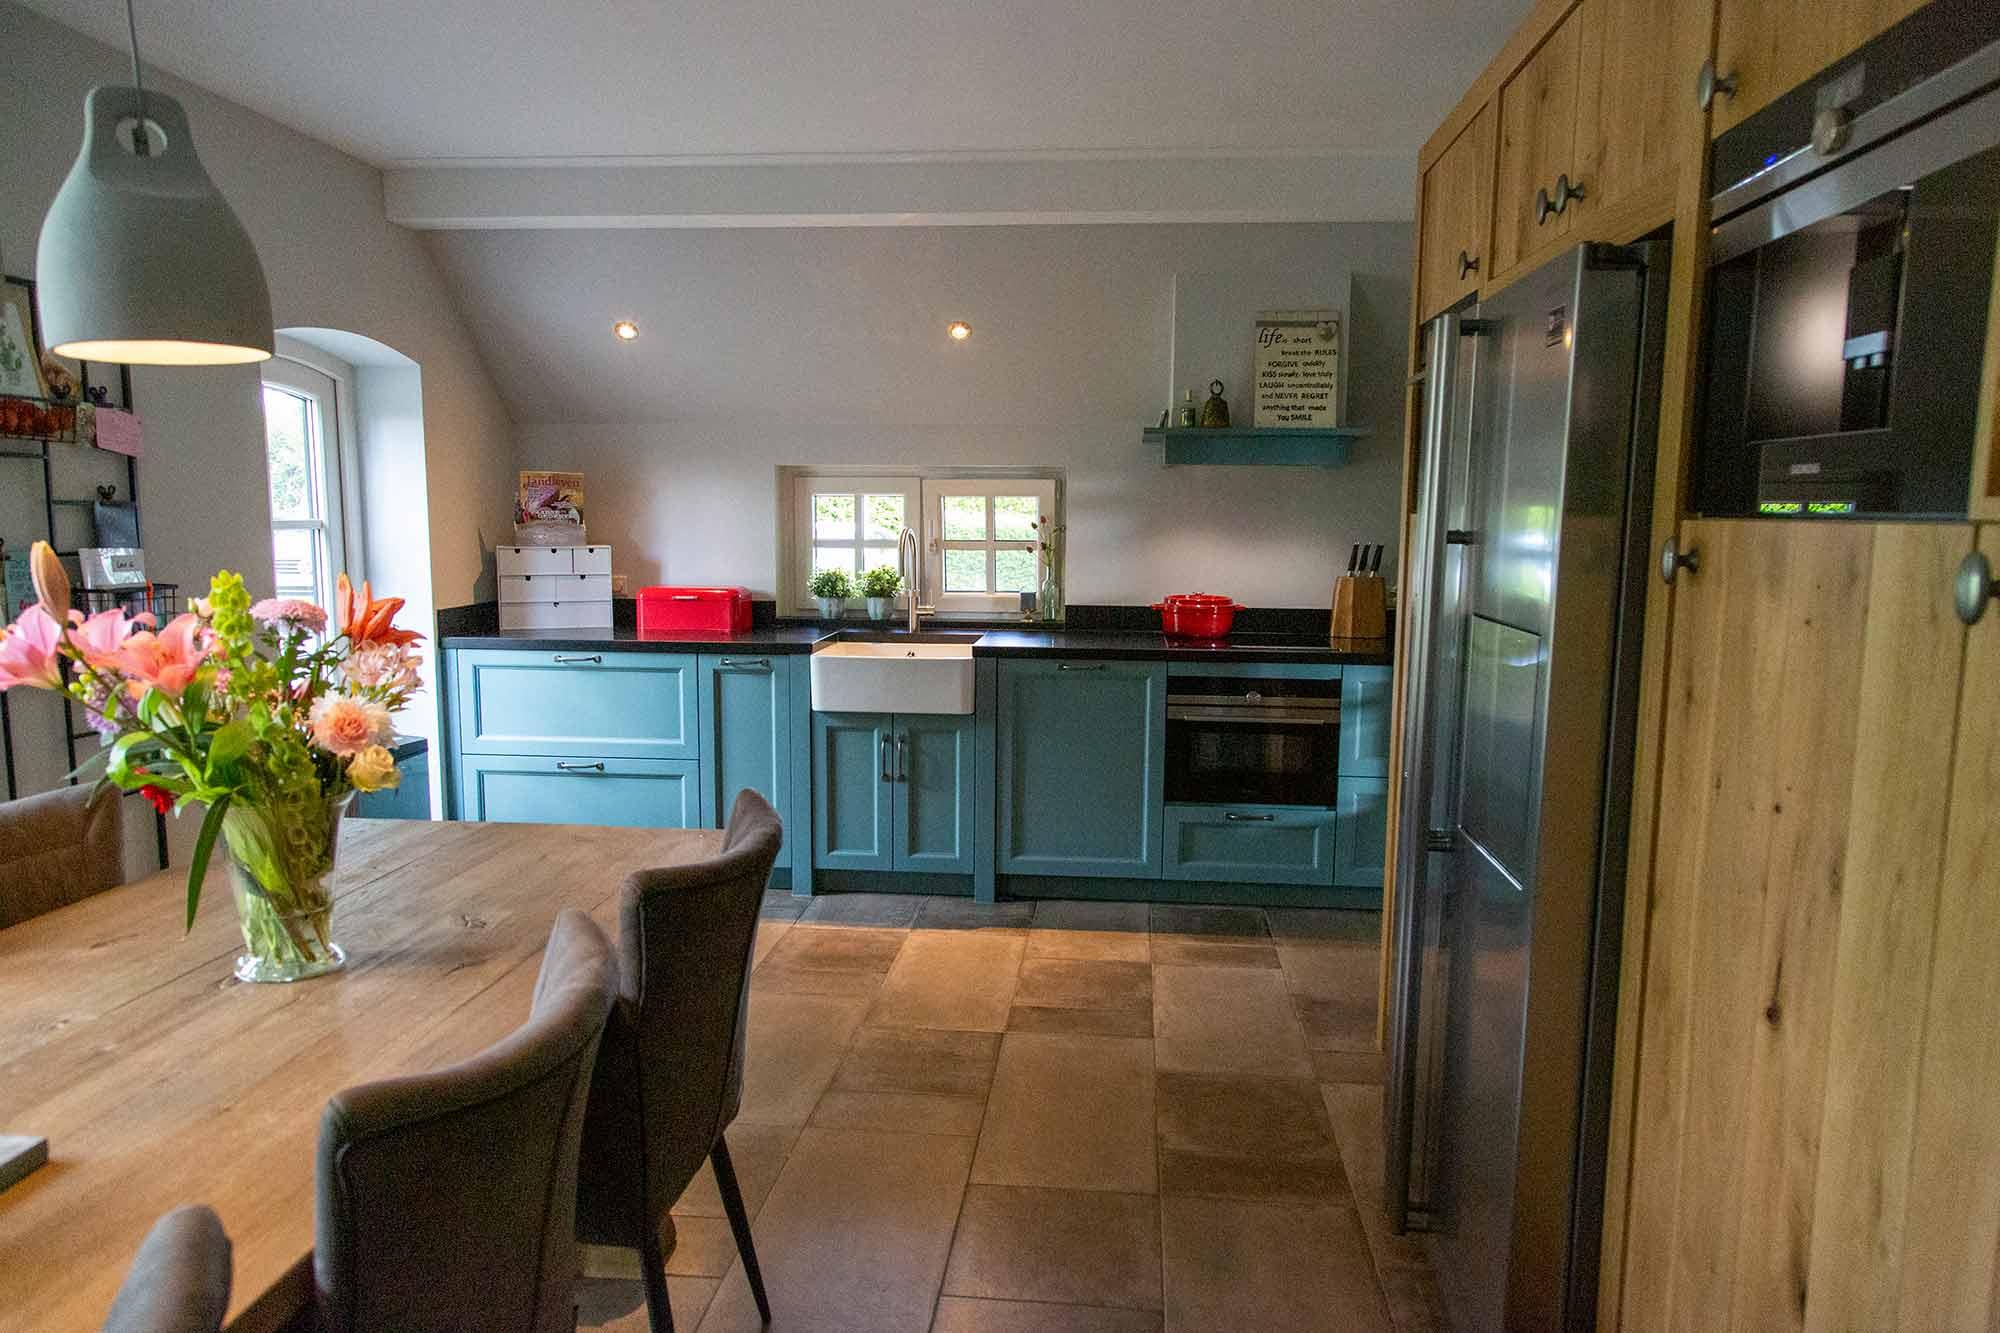 keuken-landelijk-klein